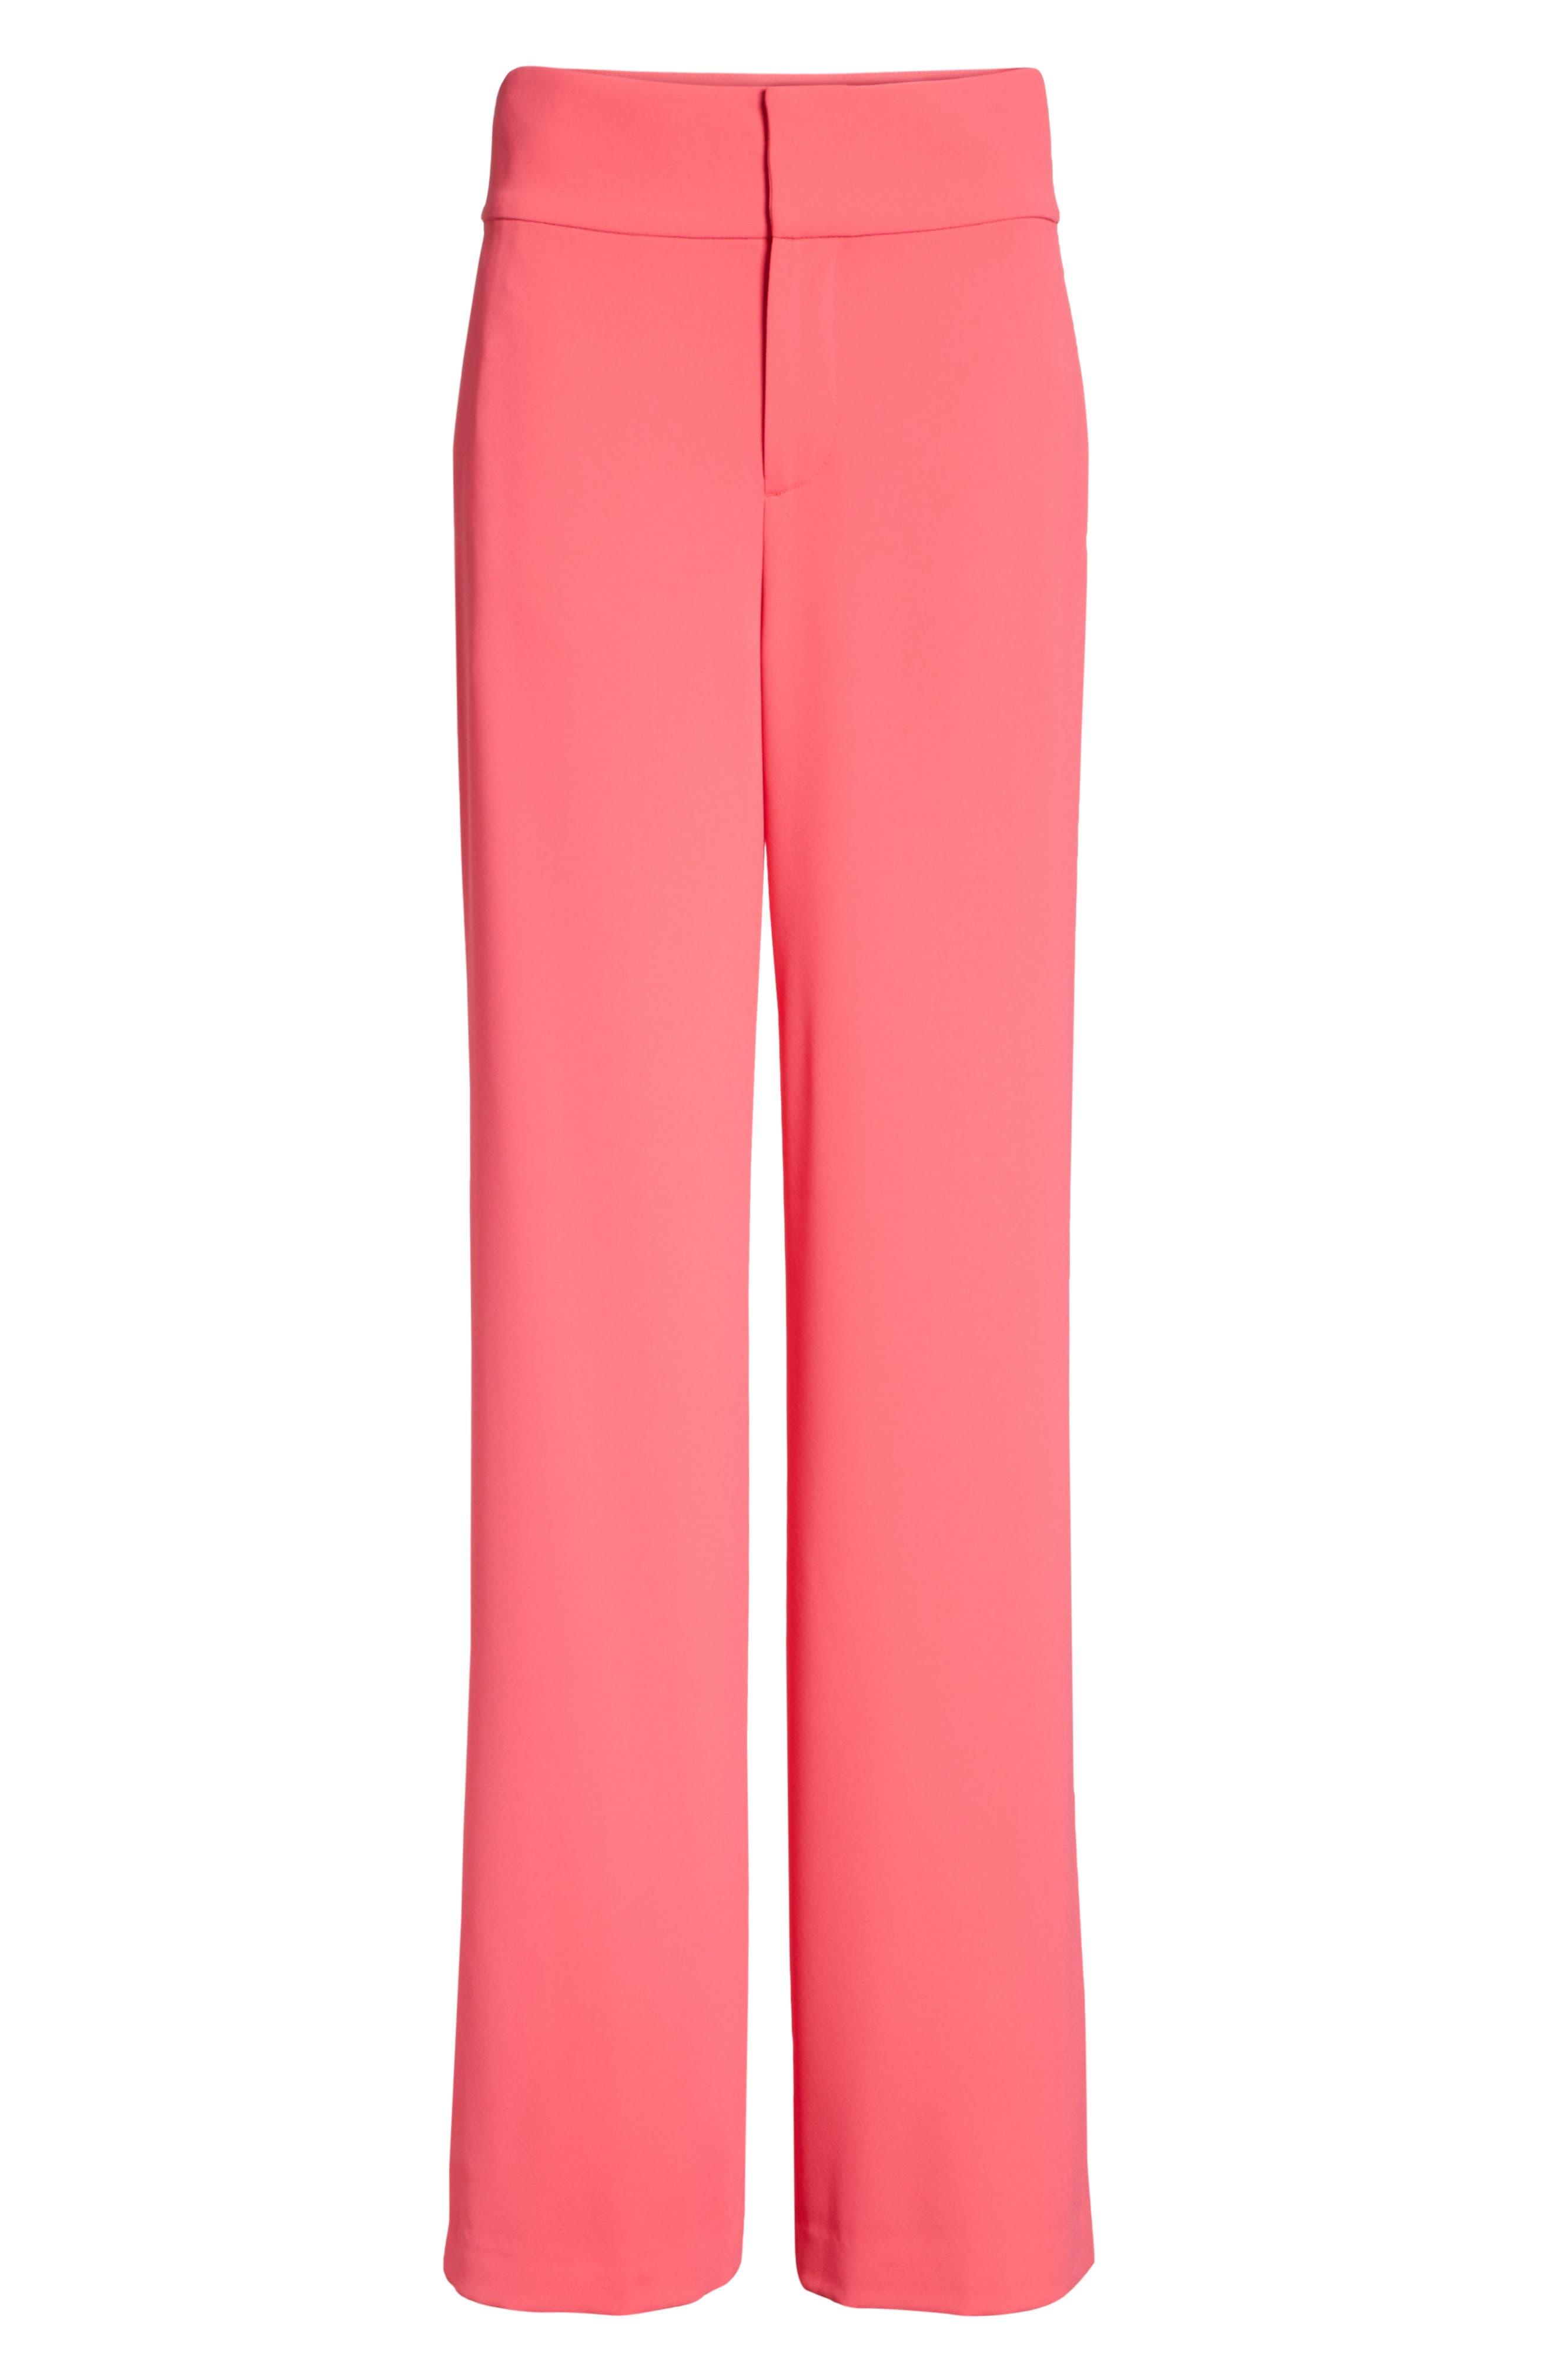 Knox Wide Leg Pants,                             Alternate thumbnail 6, color,                             649